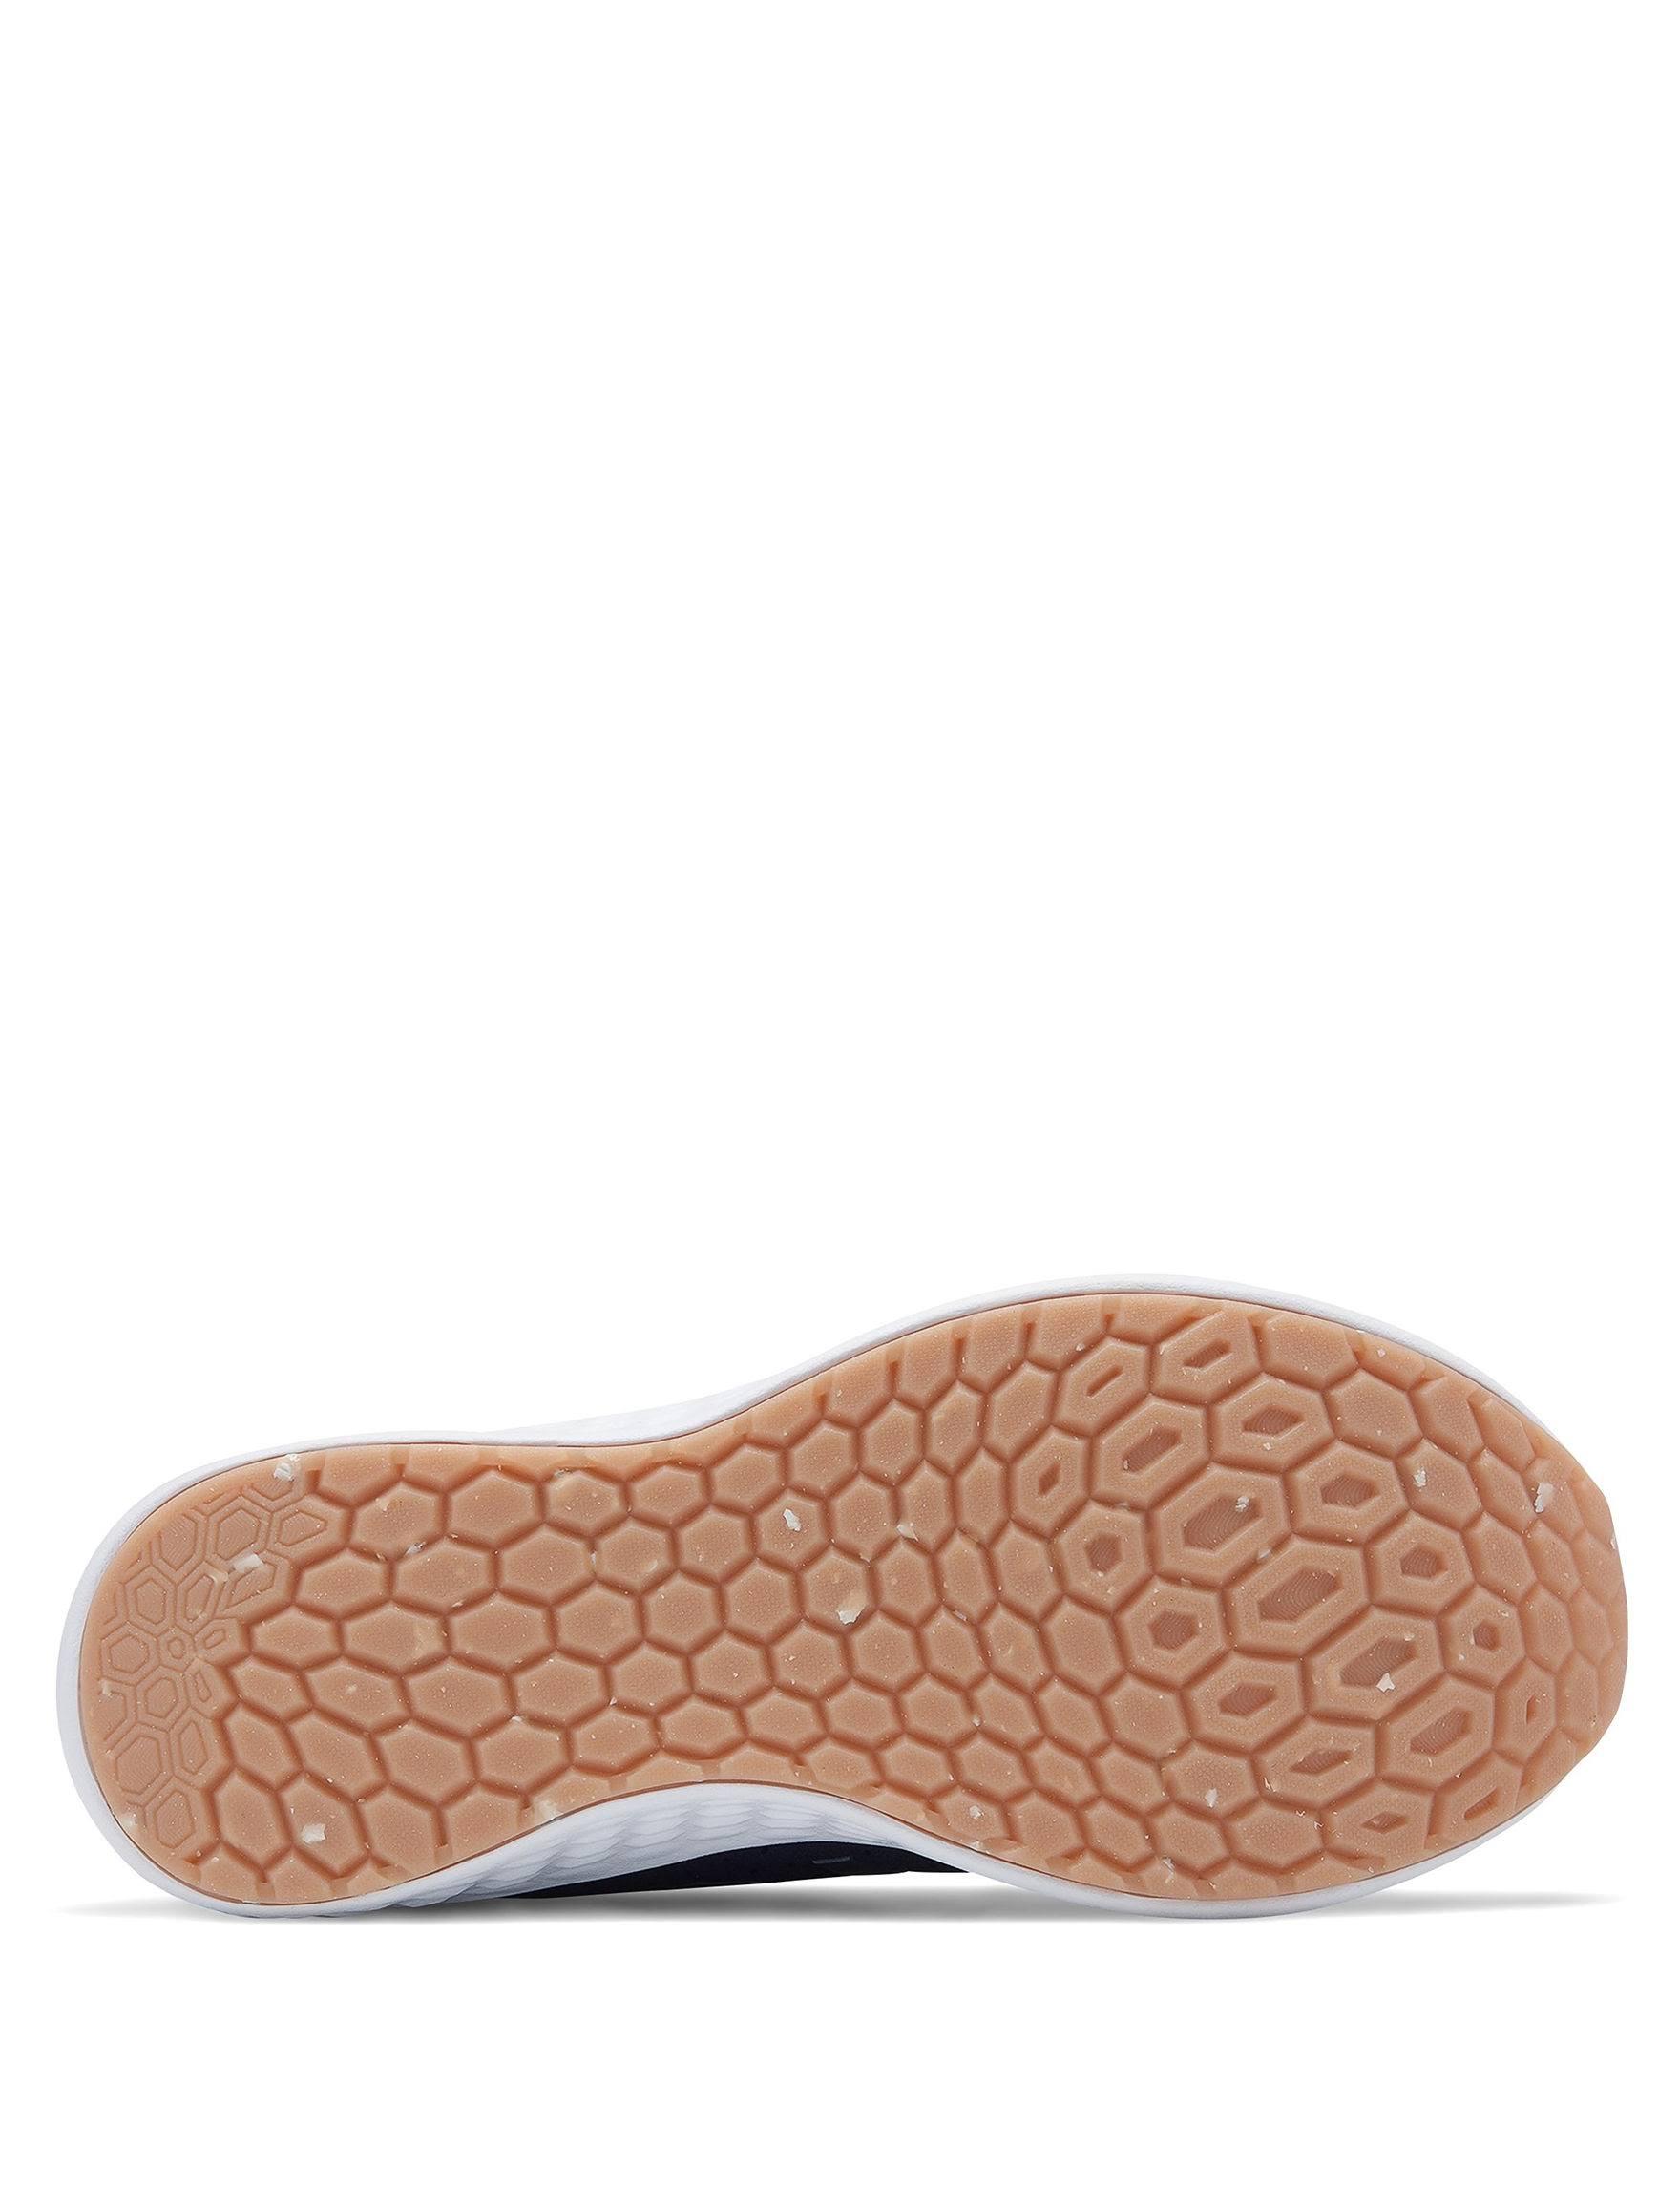 Marino El Zapatos 8 Azul Lw1 Tiendas Escenario Wsptlw1 Deportivos New En Balance Tamaño zwxrzq0Z